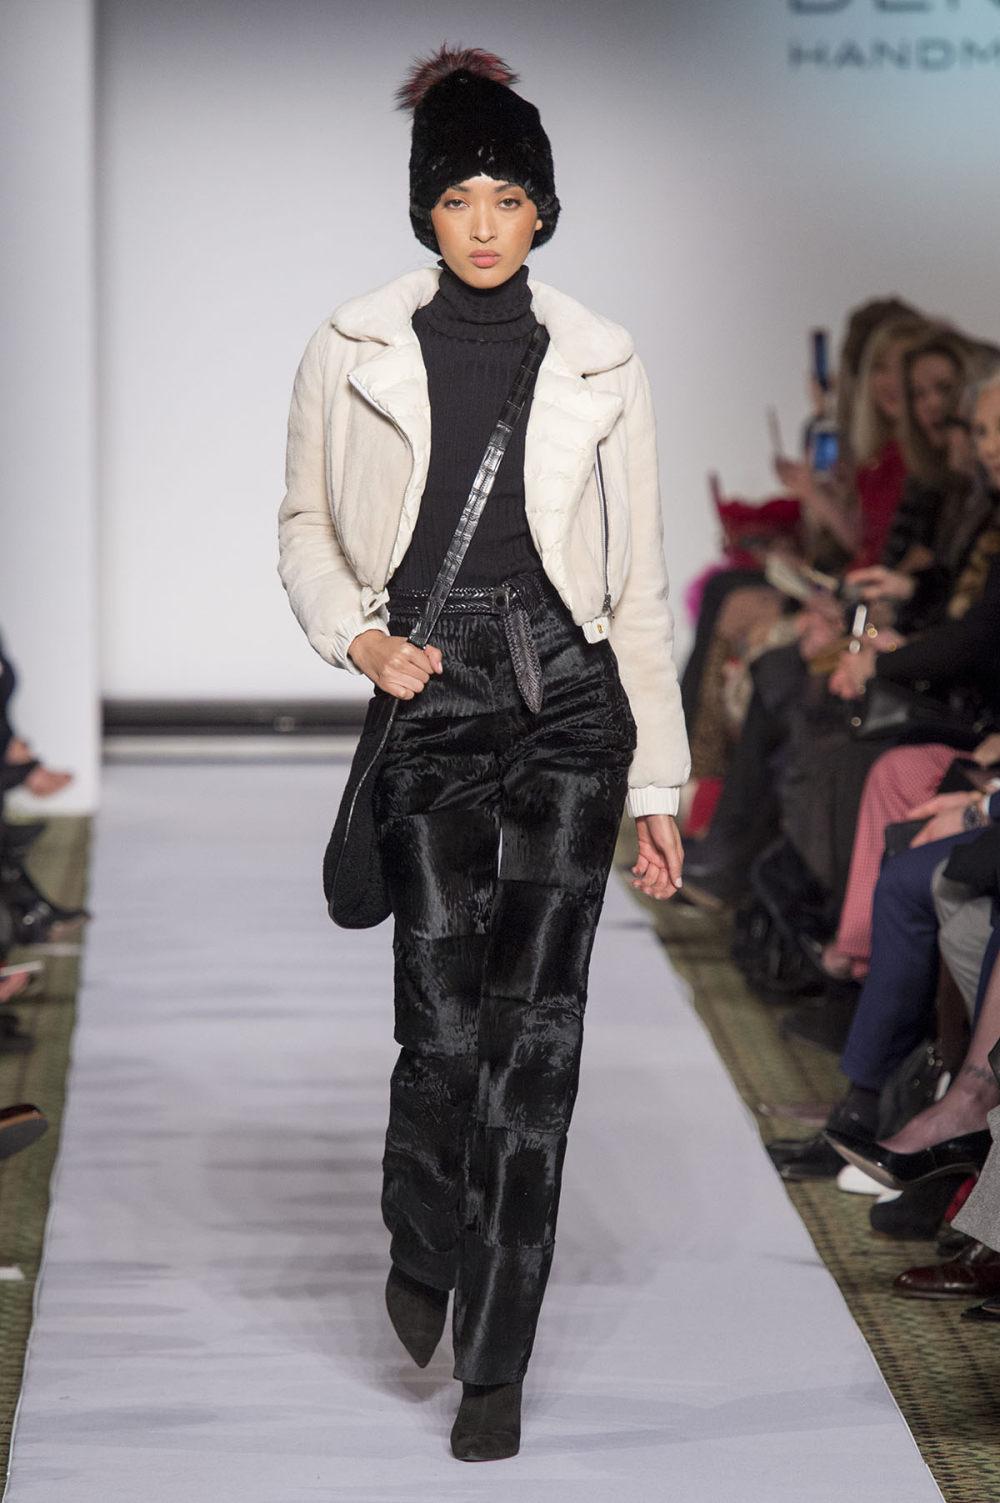 Carolina Herrera时装系列用鲜艳的颜色充满智能的黑白色调-16.jpg